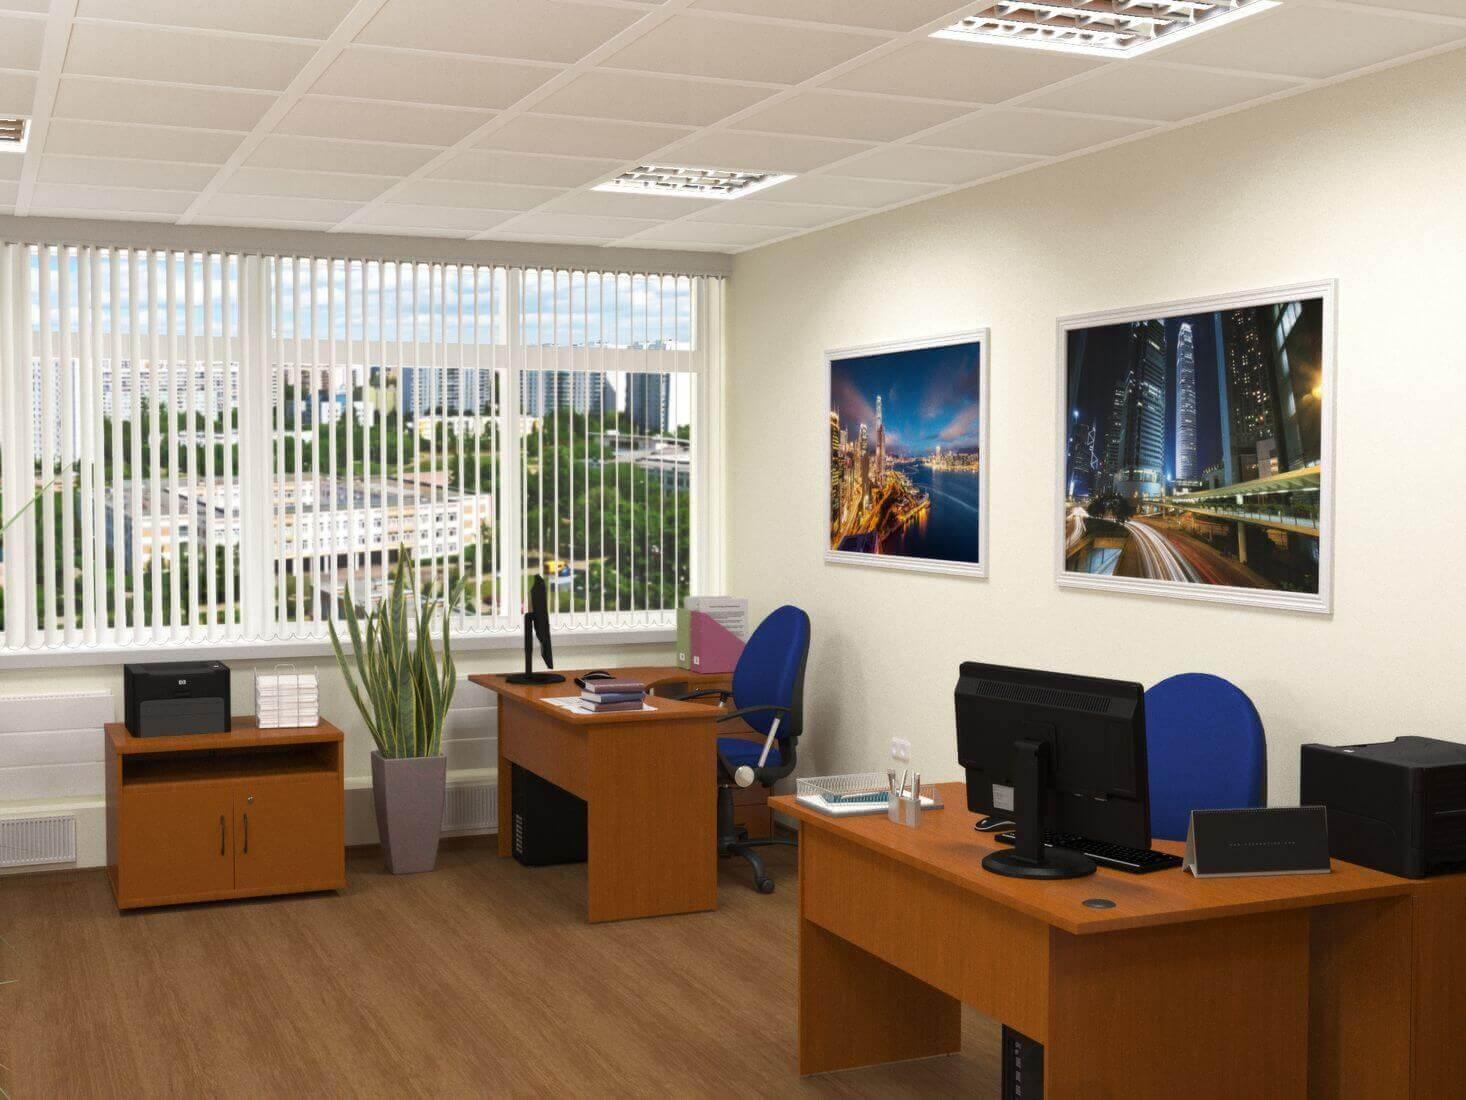 Студия Ракета переехала в новый офис | Студия Ракета